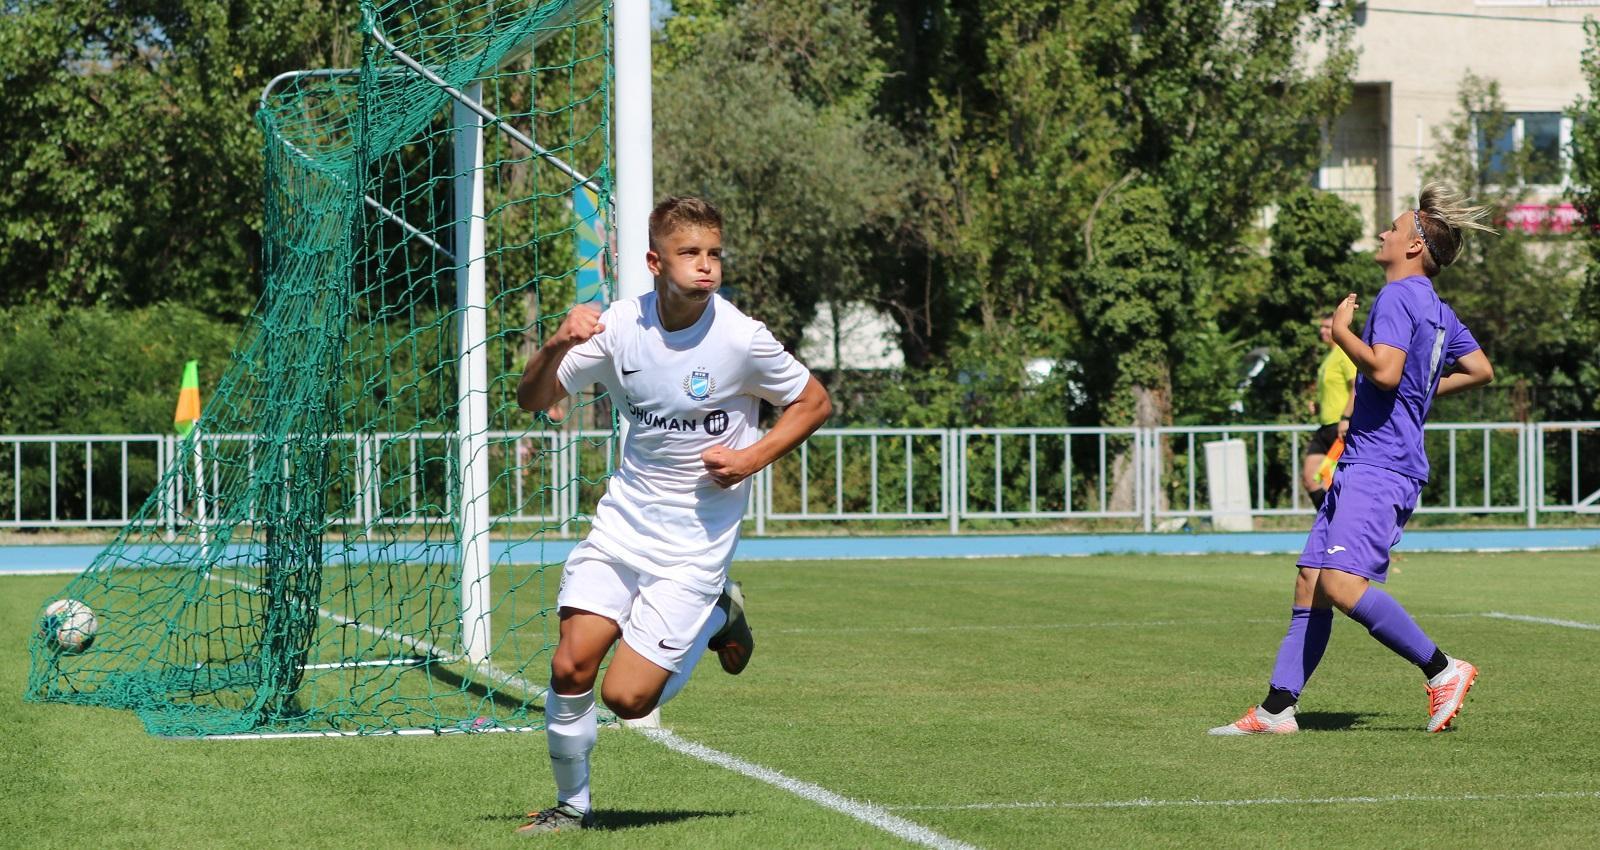 U17,U16: Két meccs, négy gól (Videó)